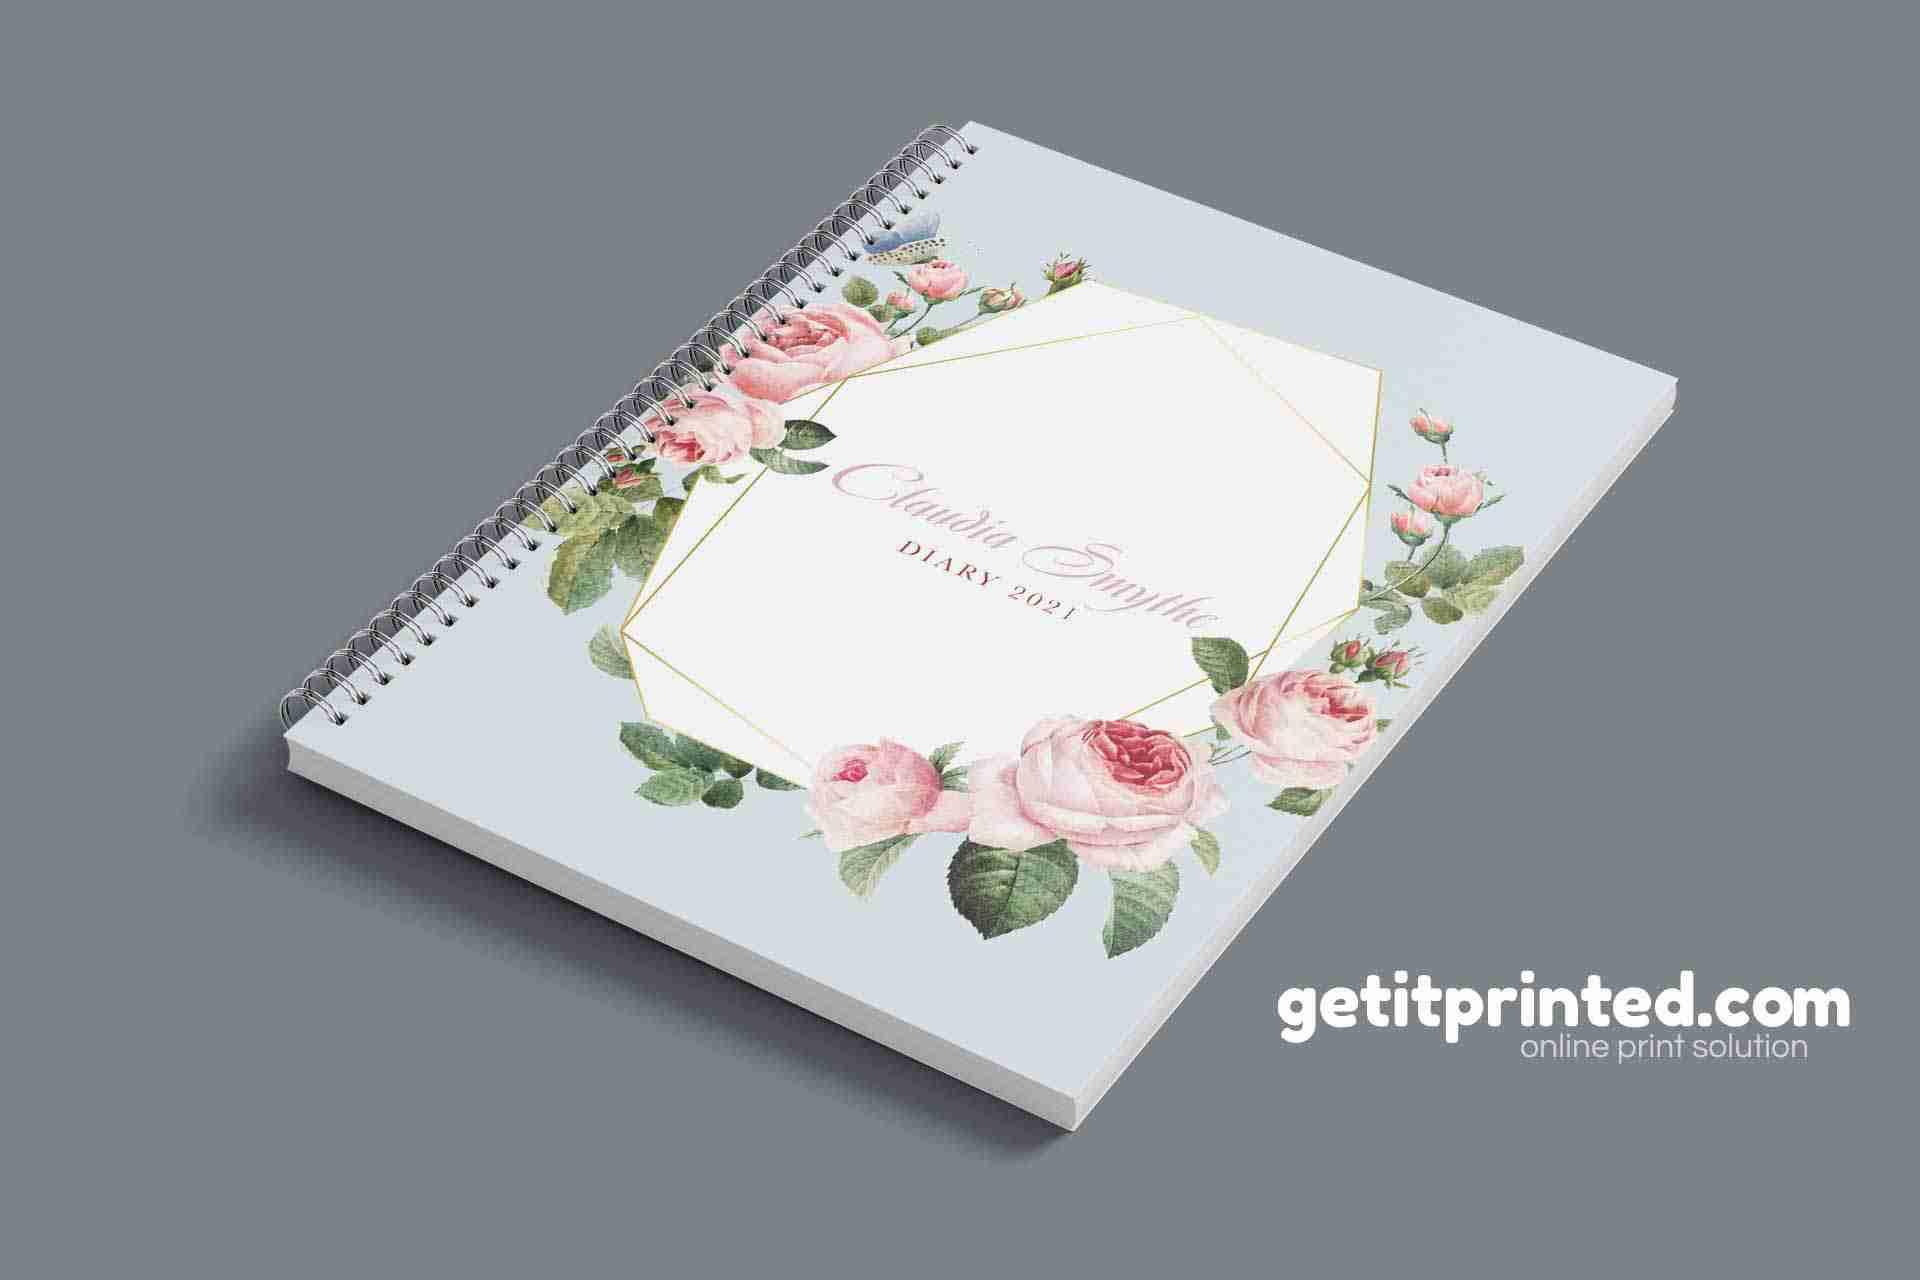 Design-0008-CUSTOM-Diary-View-1